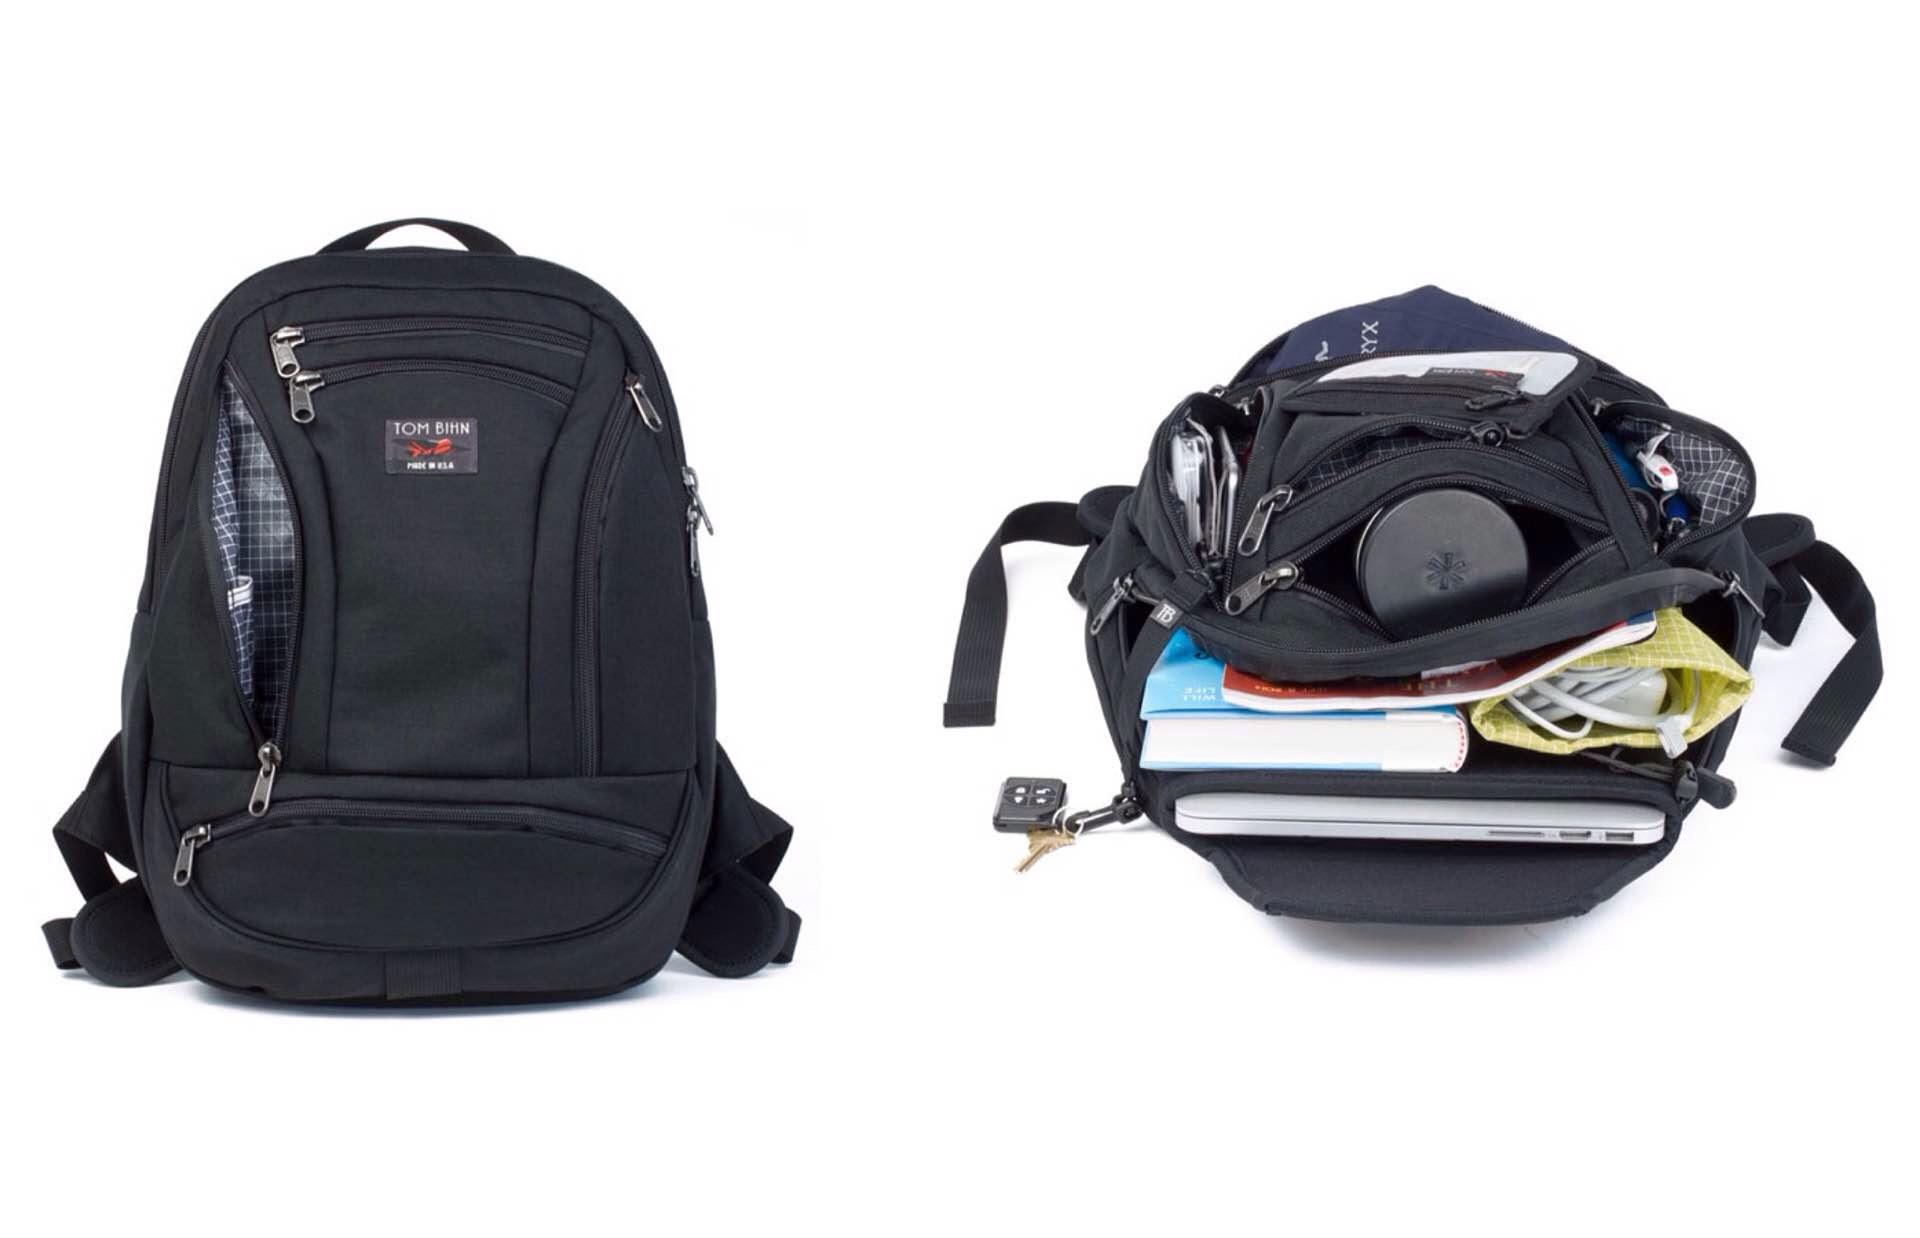 tom-bihn-synapse-19-backpack